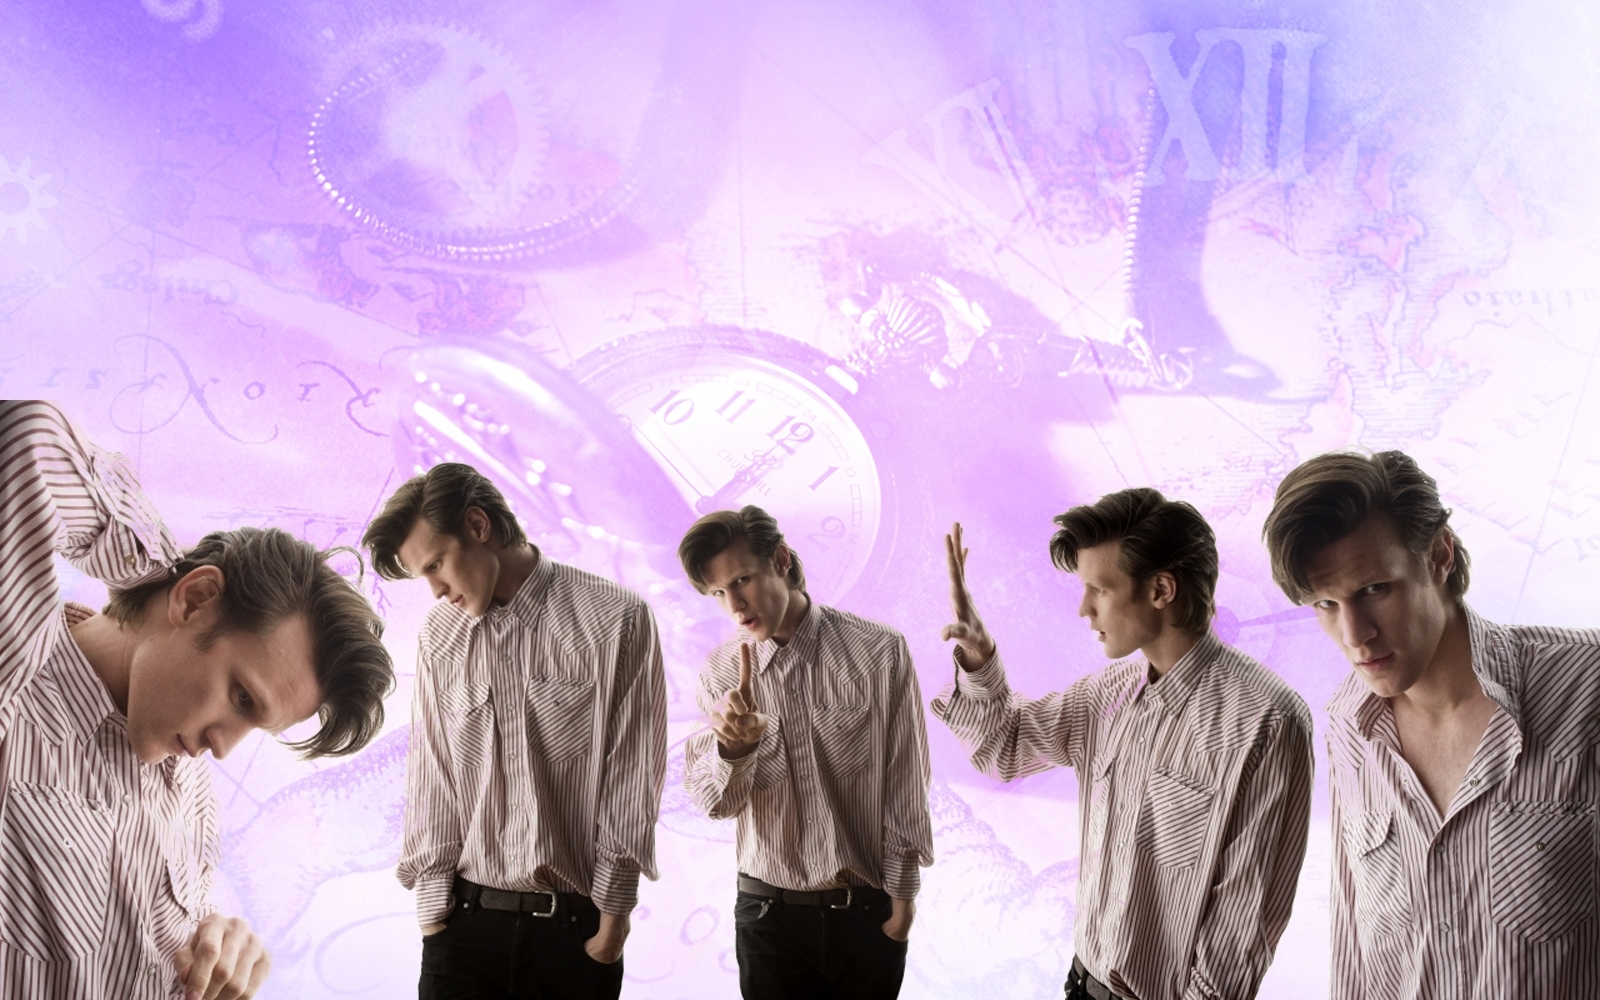 Matt Smith Wallpaper   Doctor Who Wallpaper 12613348 1600x1000